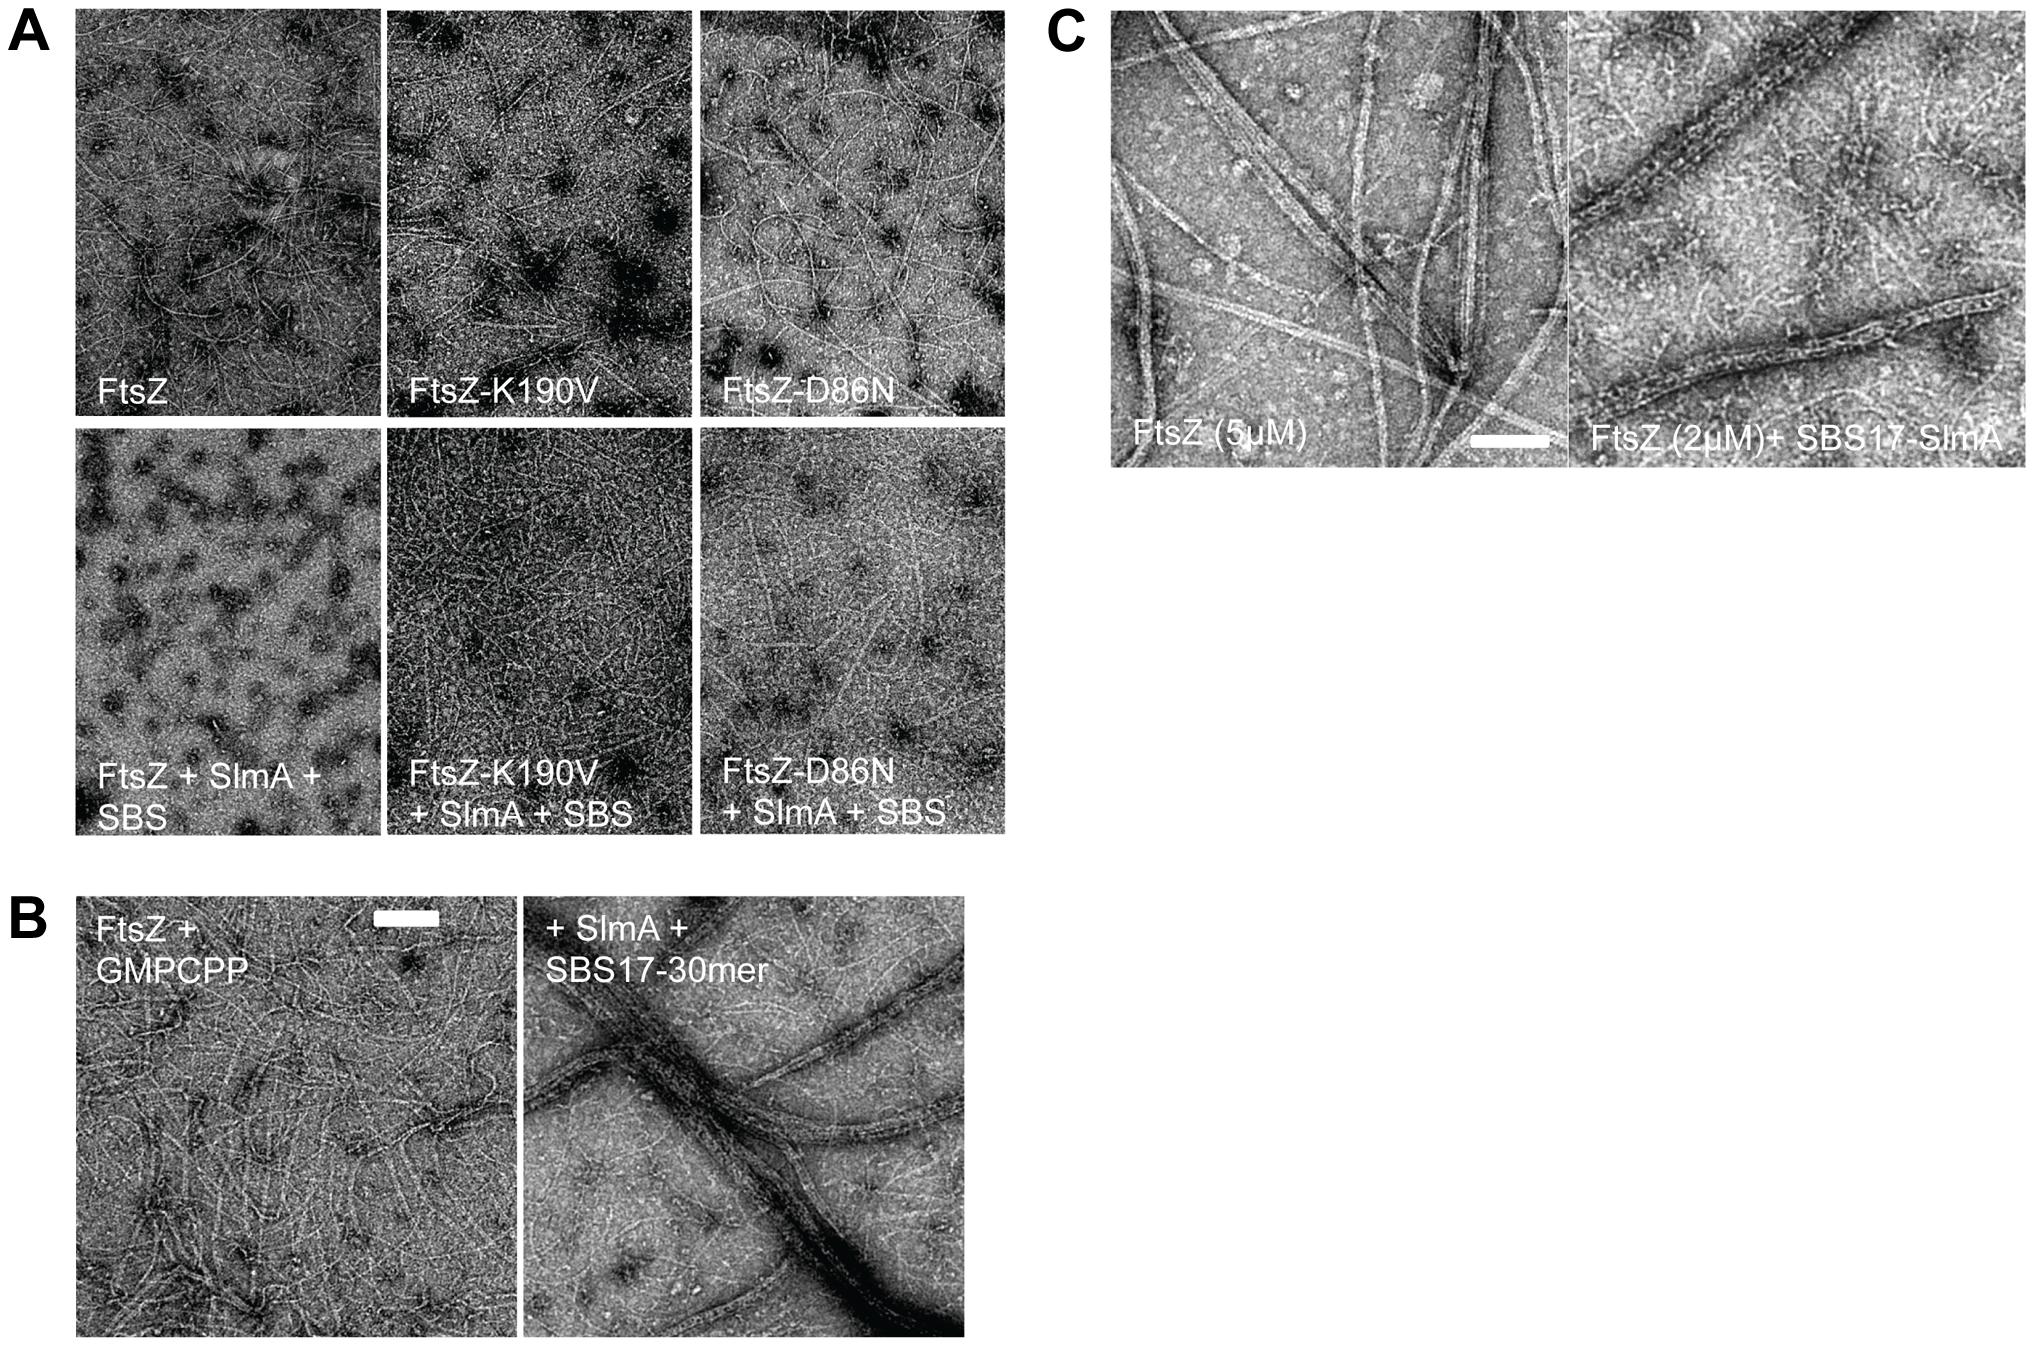 FtsZ mutants are resistant to SlmA antagonism of FtsZ polymerization.